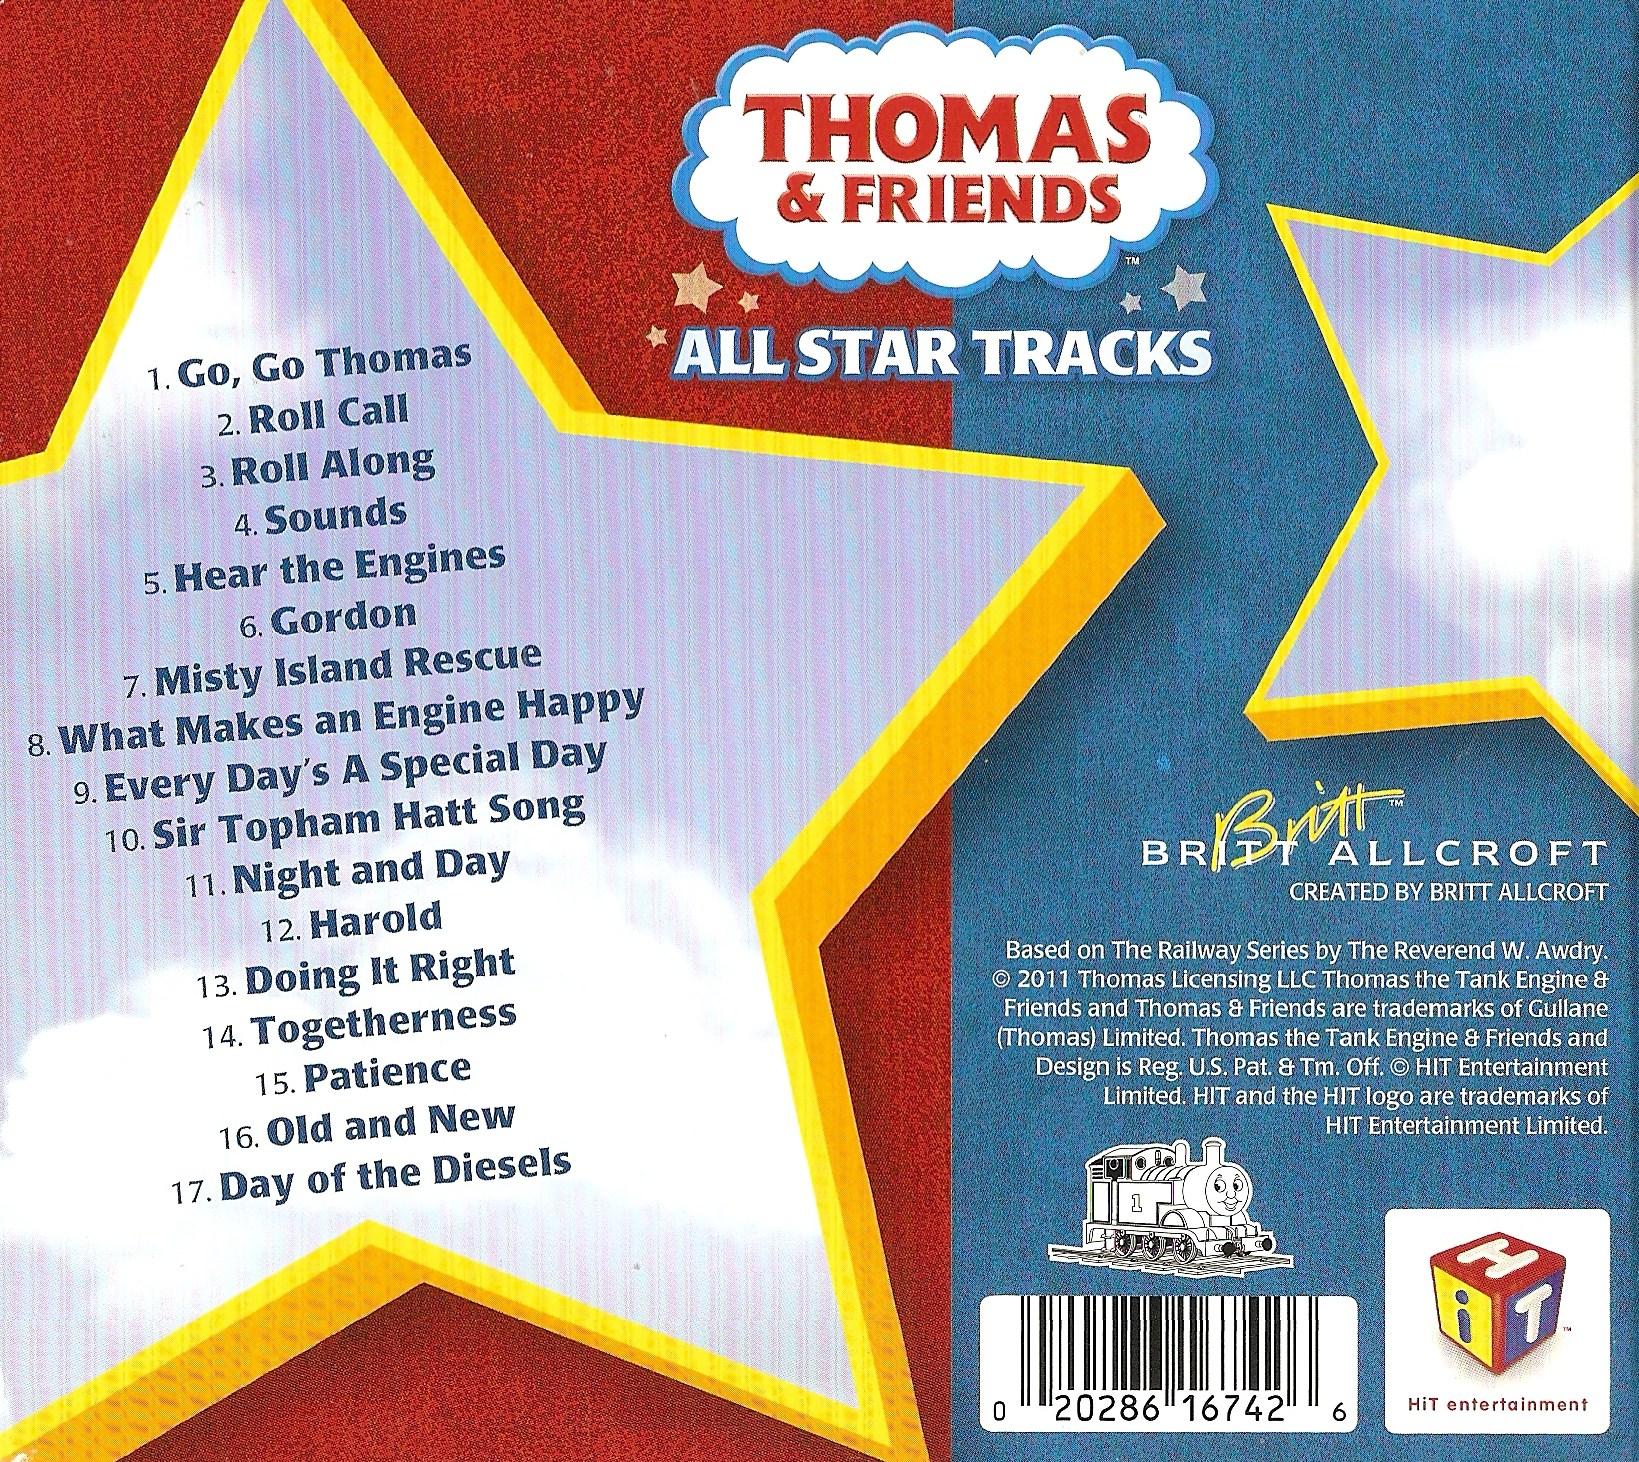 All Star Tracks | Thomas the Tank Engine Wikia | FANDOM